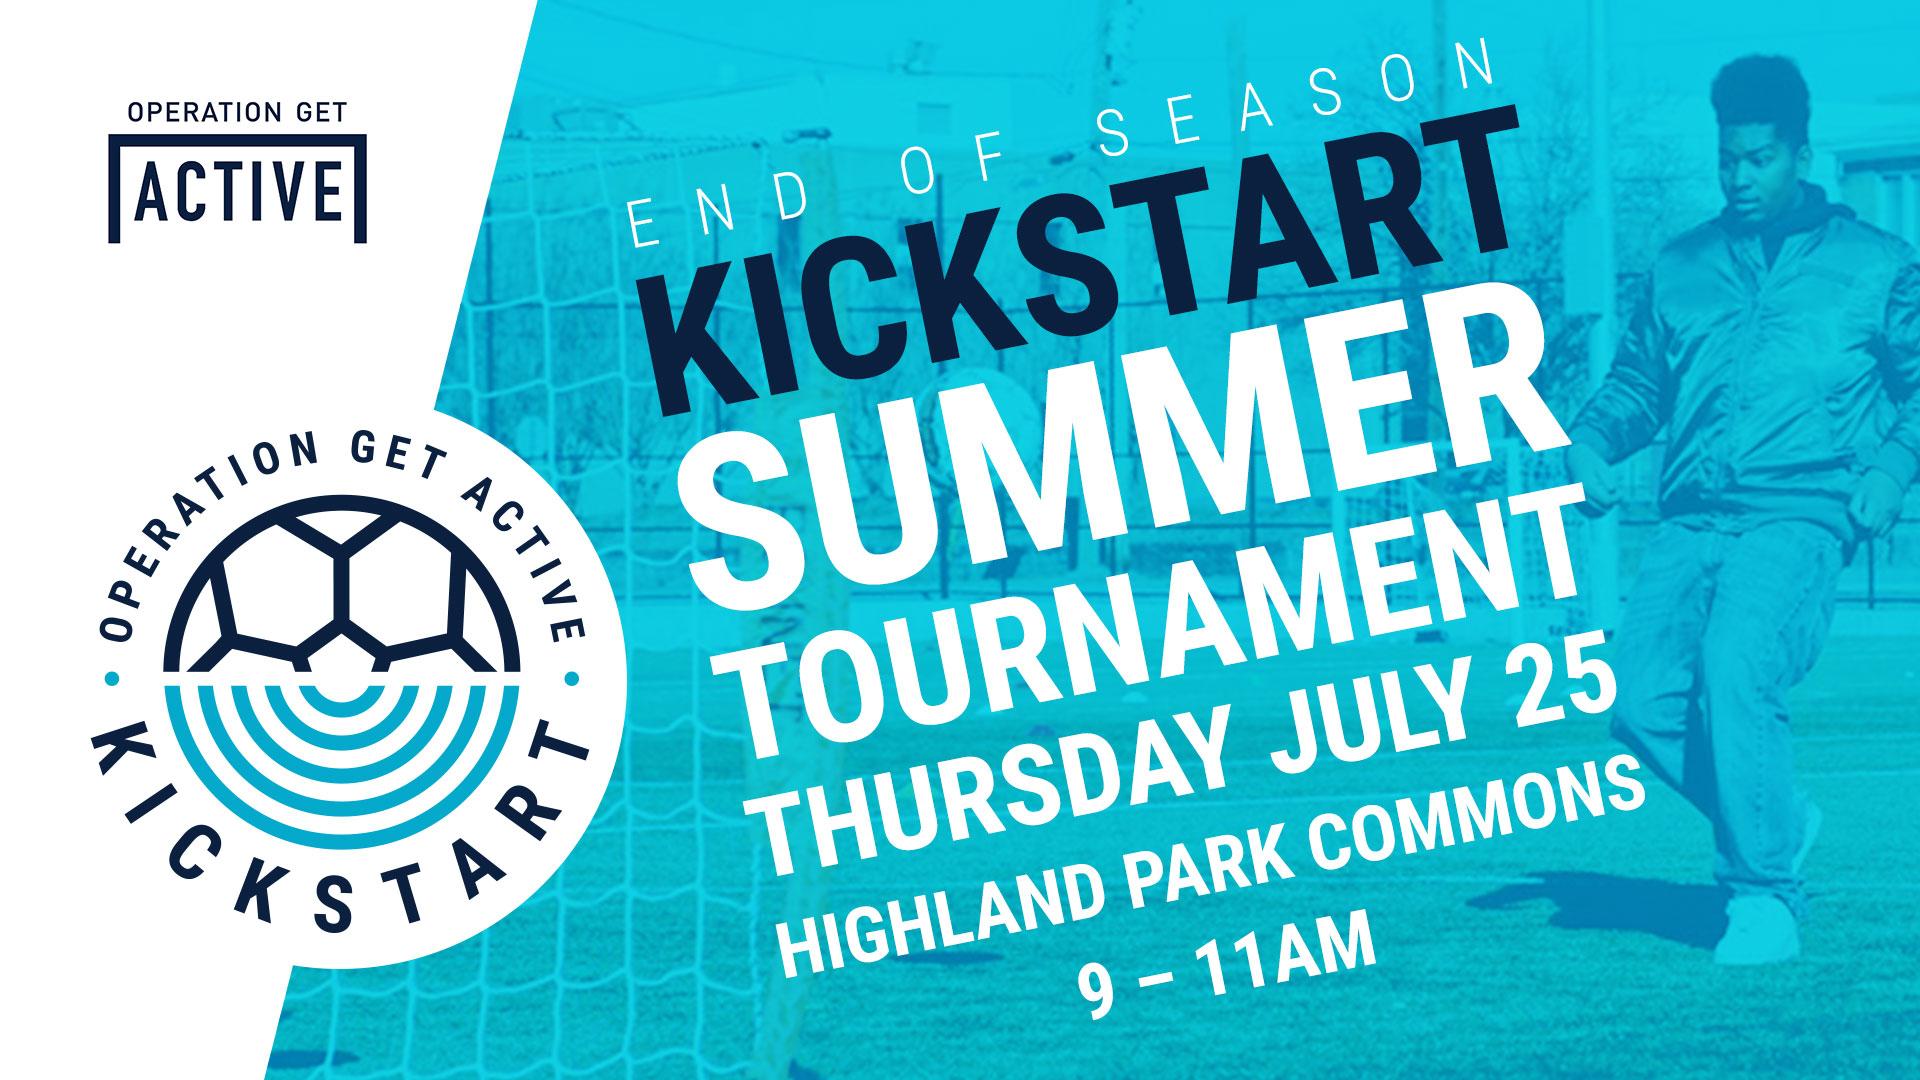 OGA_Kickstart-Tournament_FB-EVENT-POST.jpg